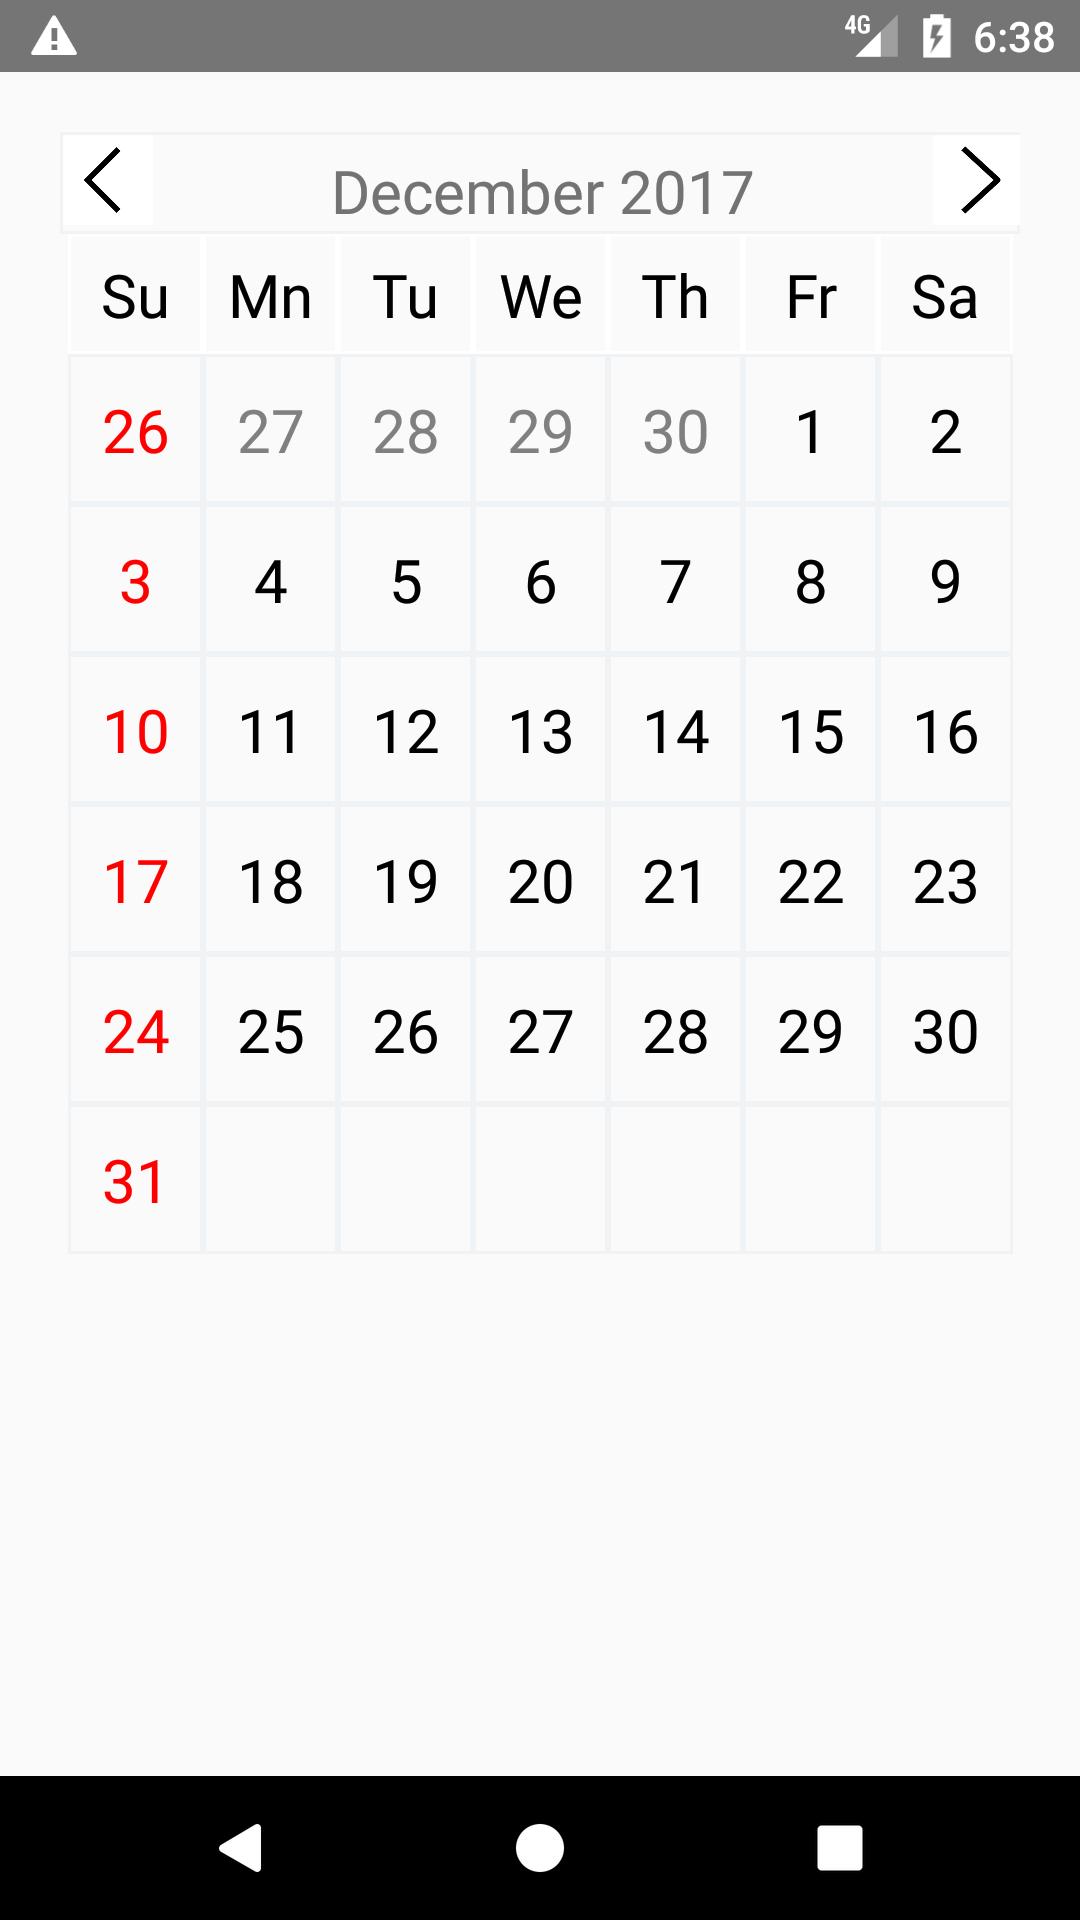 Package - react-native-calendar-date-picker